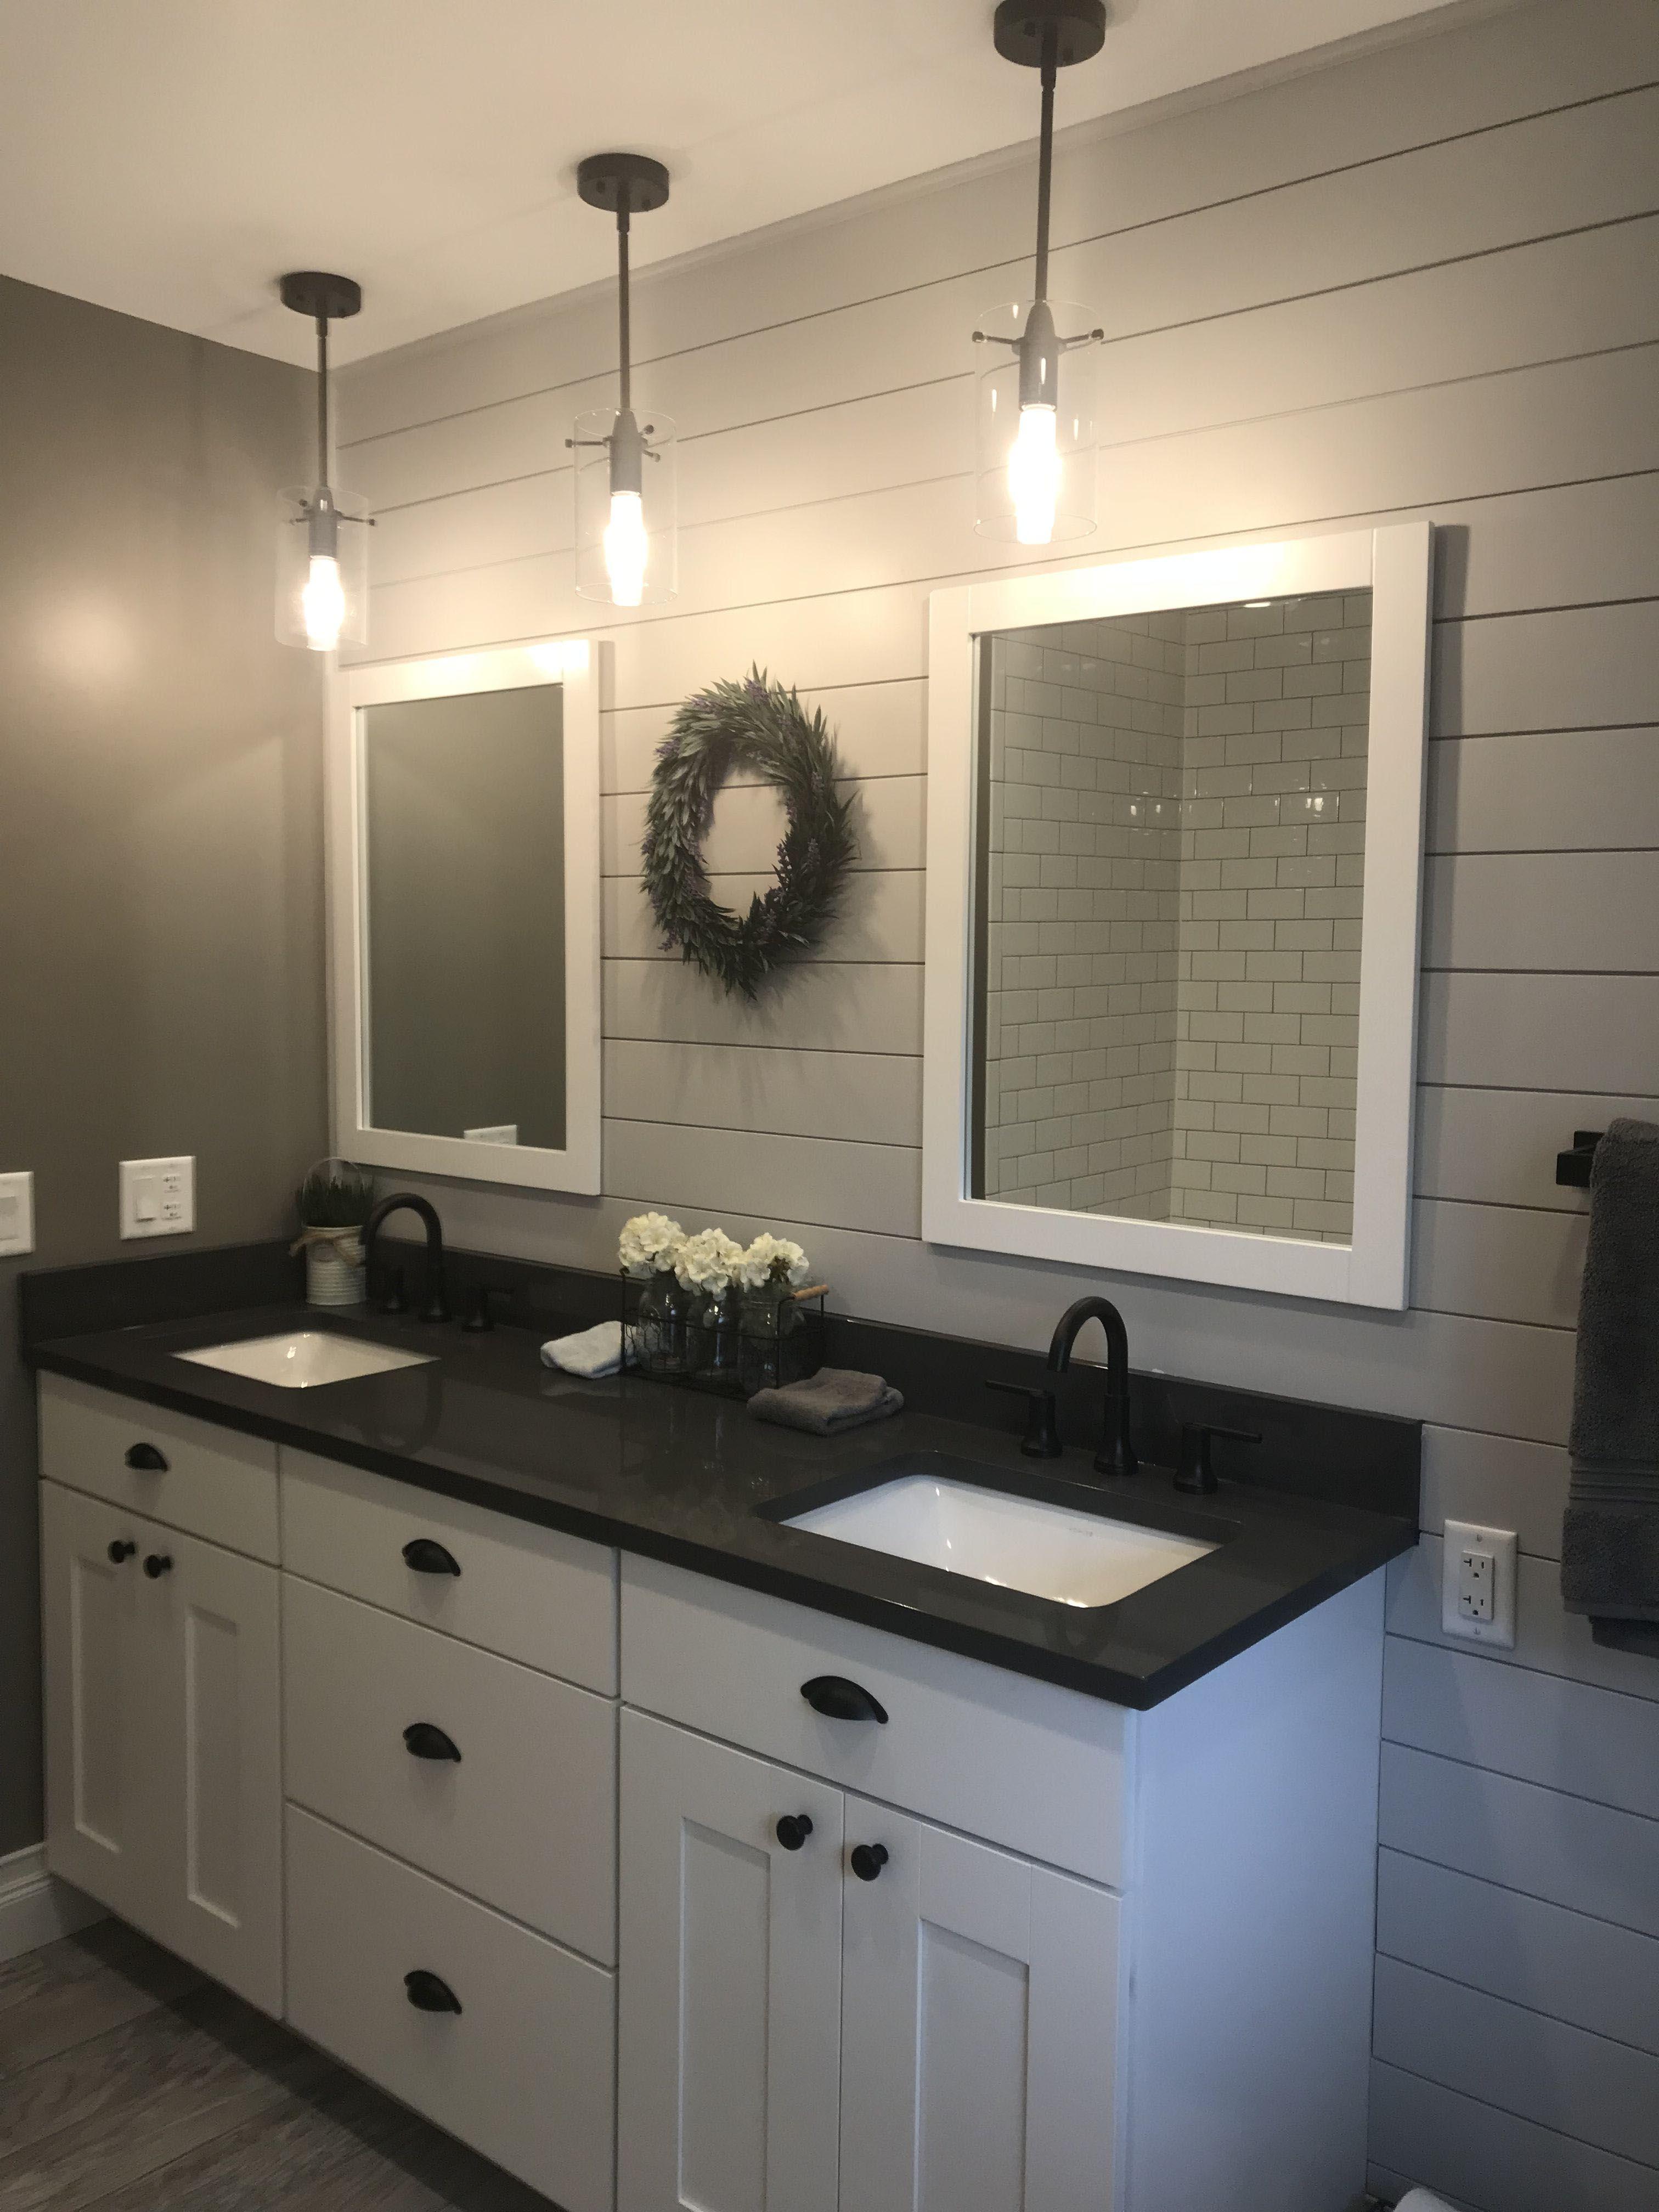 Find 6 Foot Bathroom Light Fixture Only